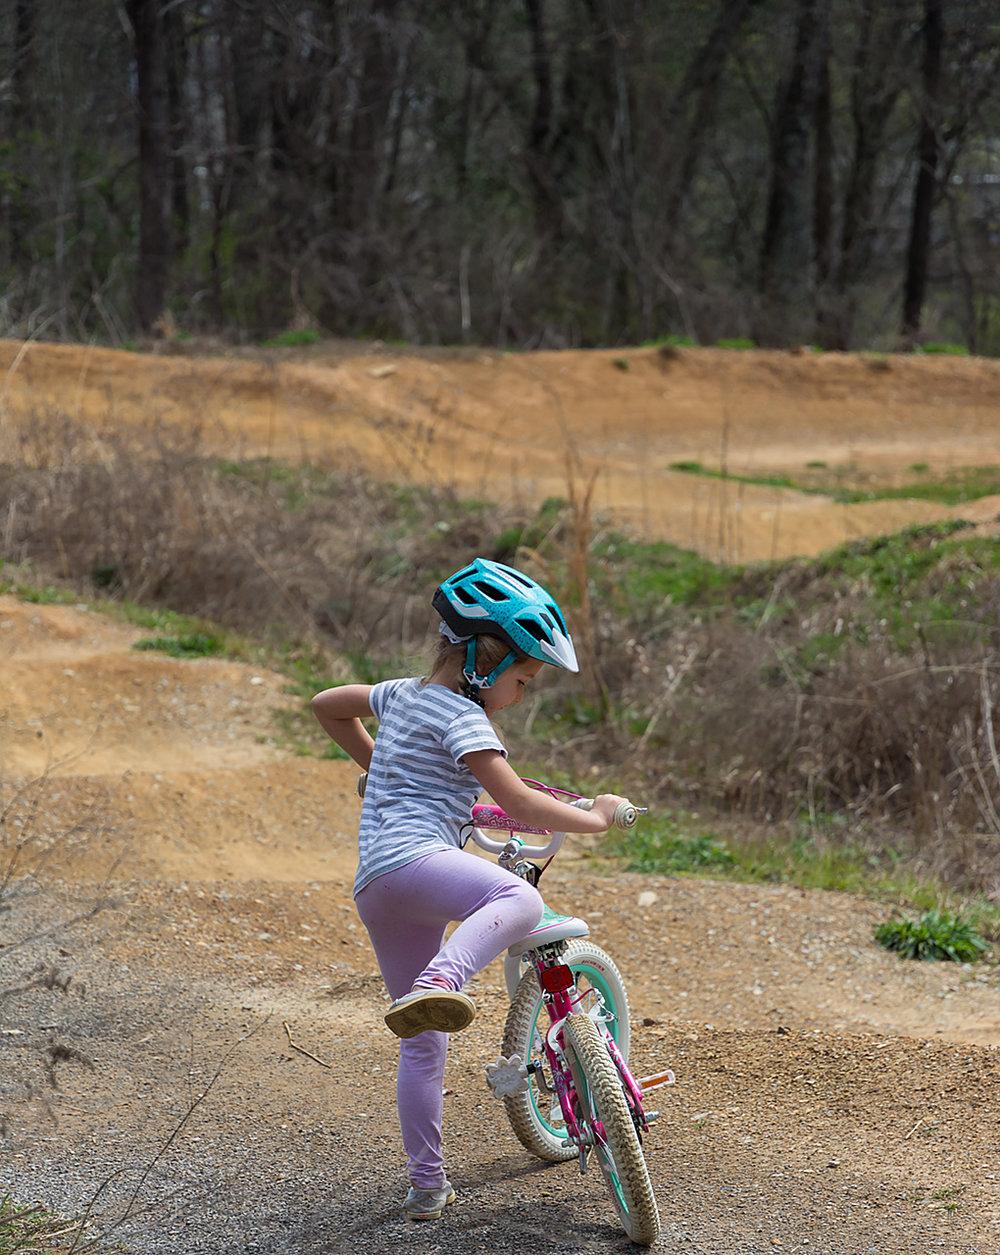 Julia forgot her bike... so she just ran in circles